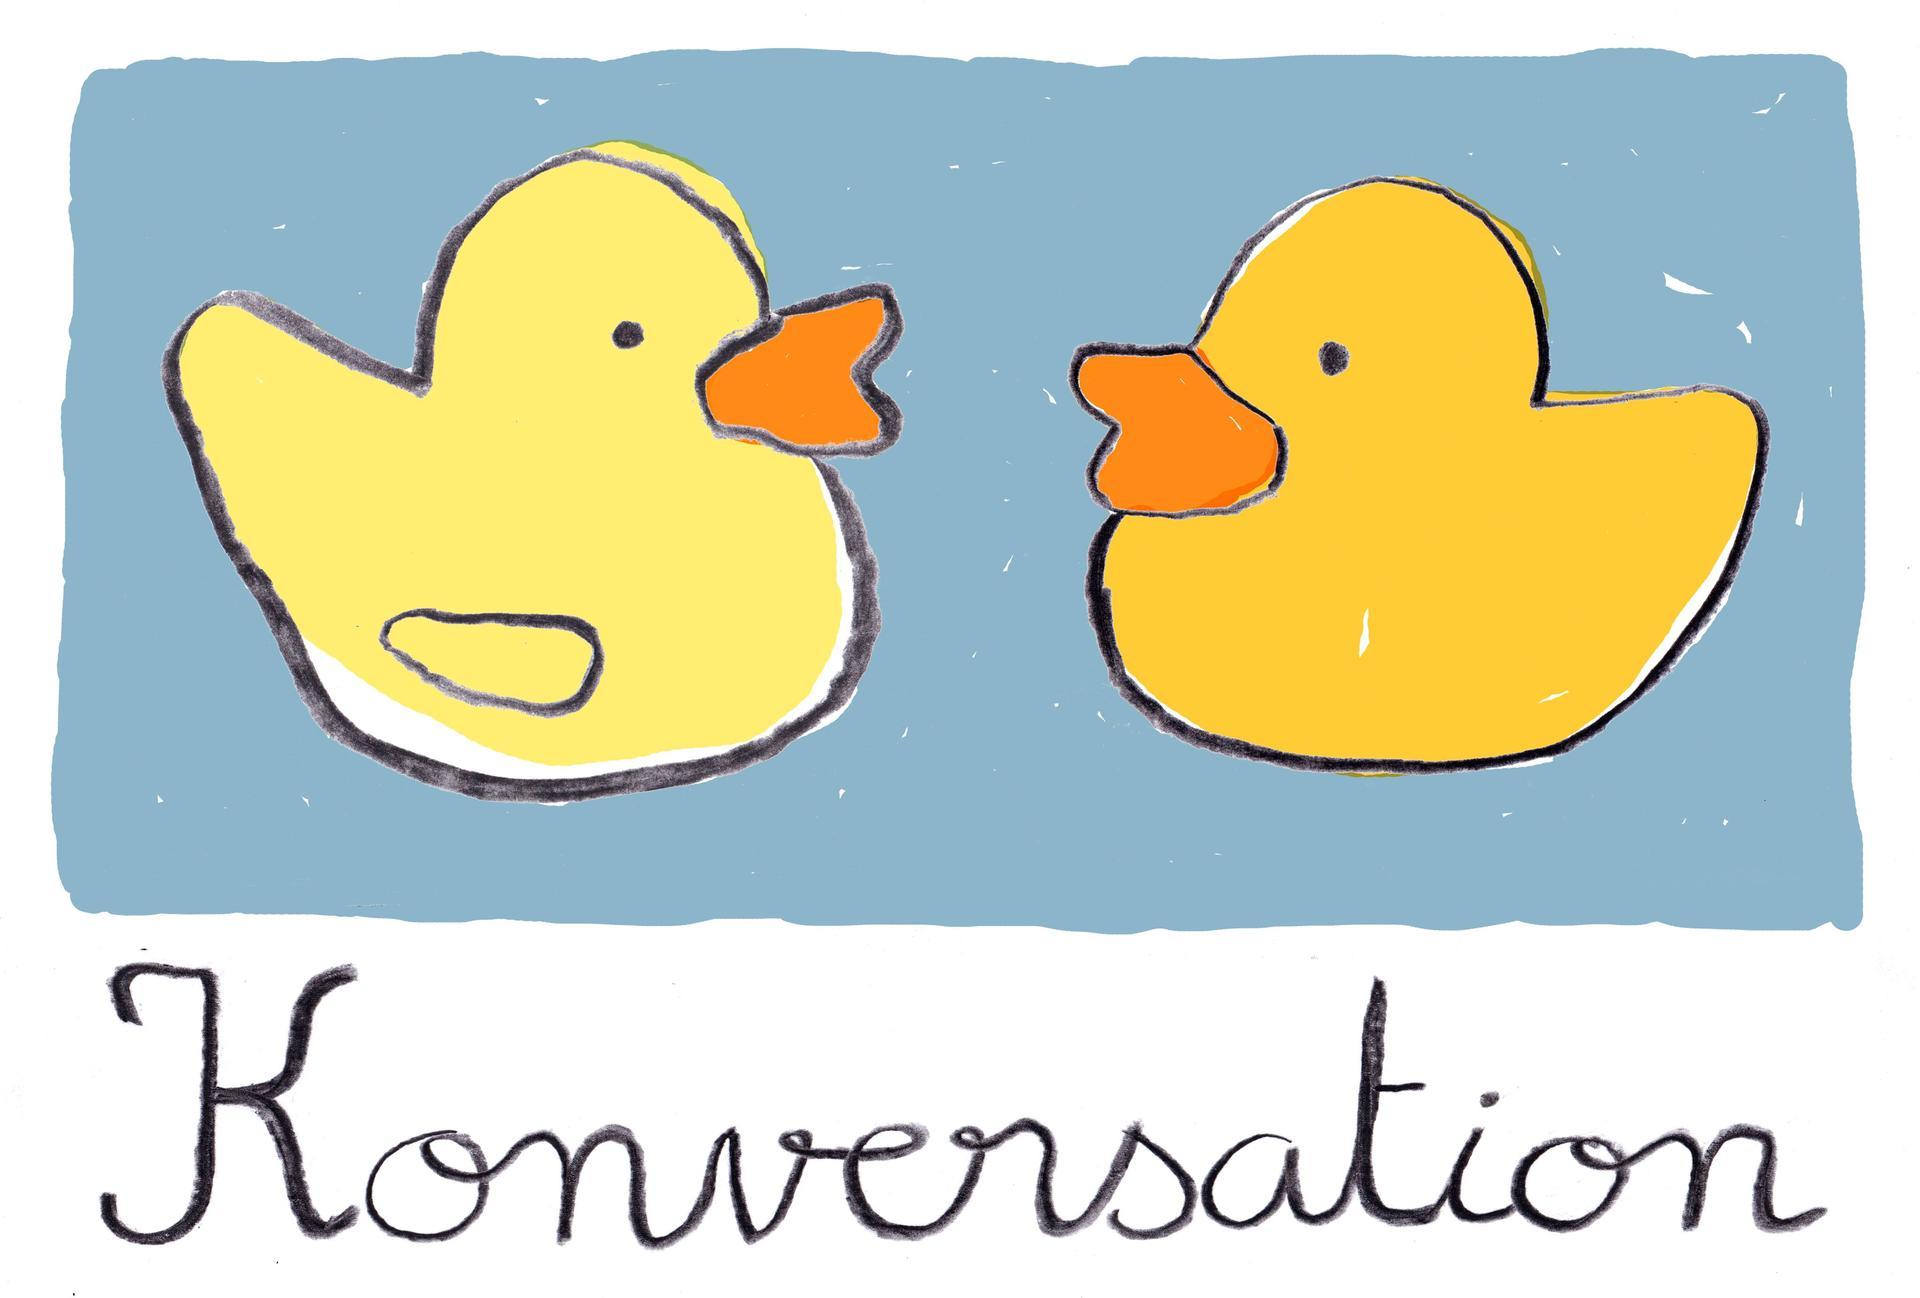 LOOSTIK_Konversation_copyright_Marianne_Tricot__1_